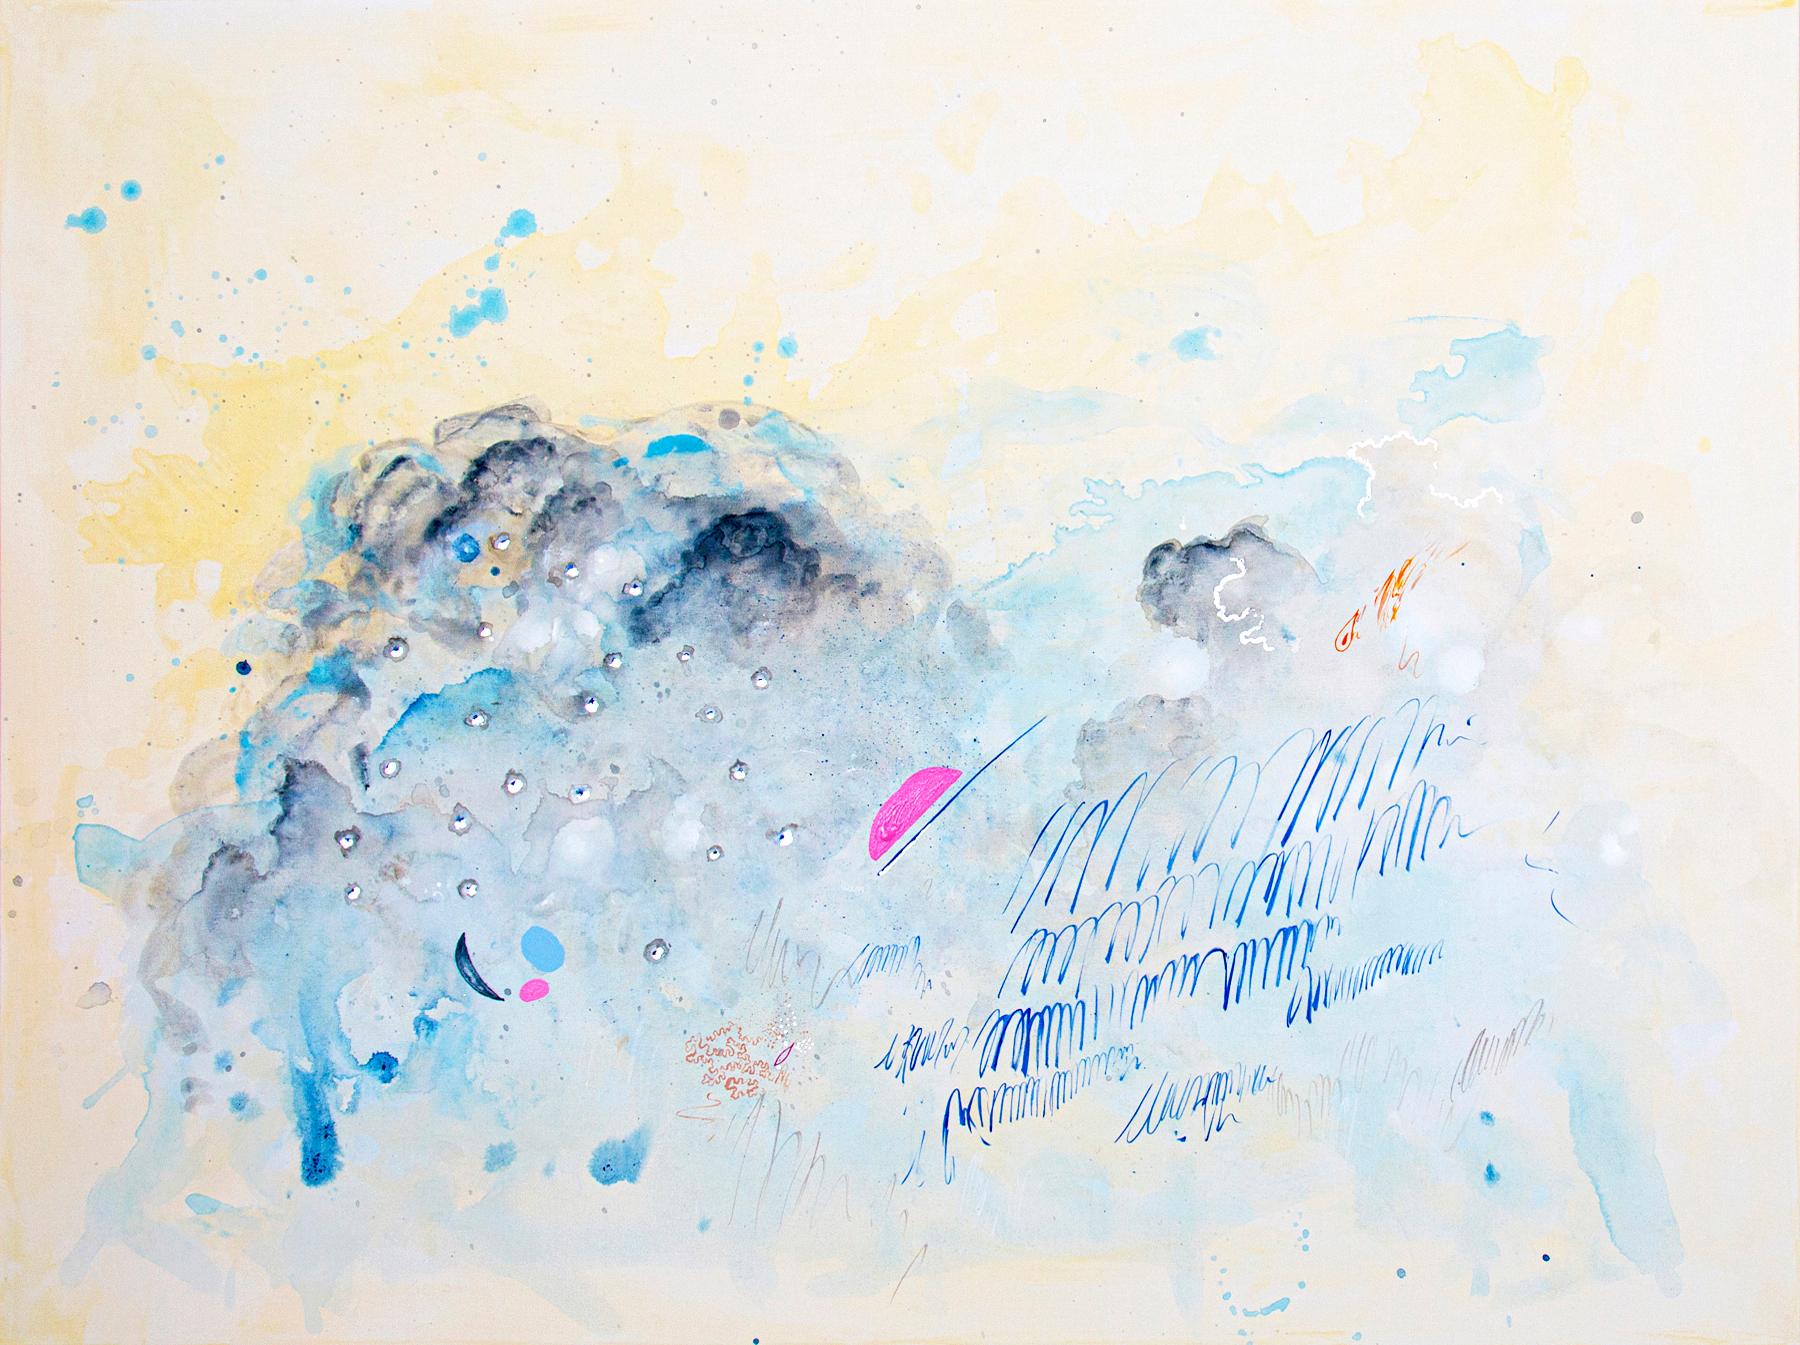 1 nature s lyric 36x48x1.5 acrylic on canvas deepa koshaley  jhddrs